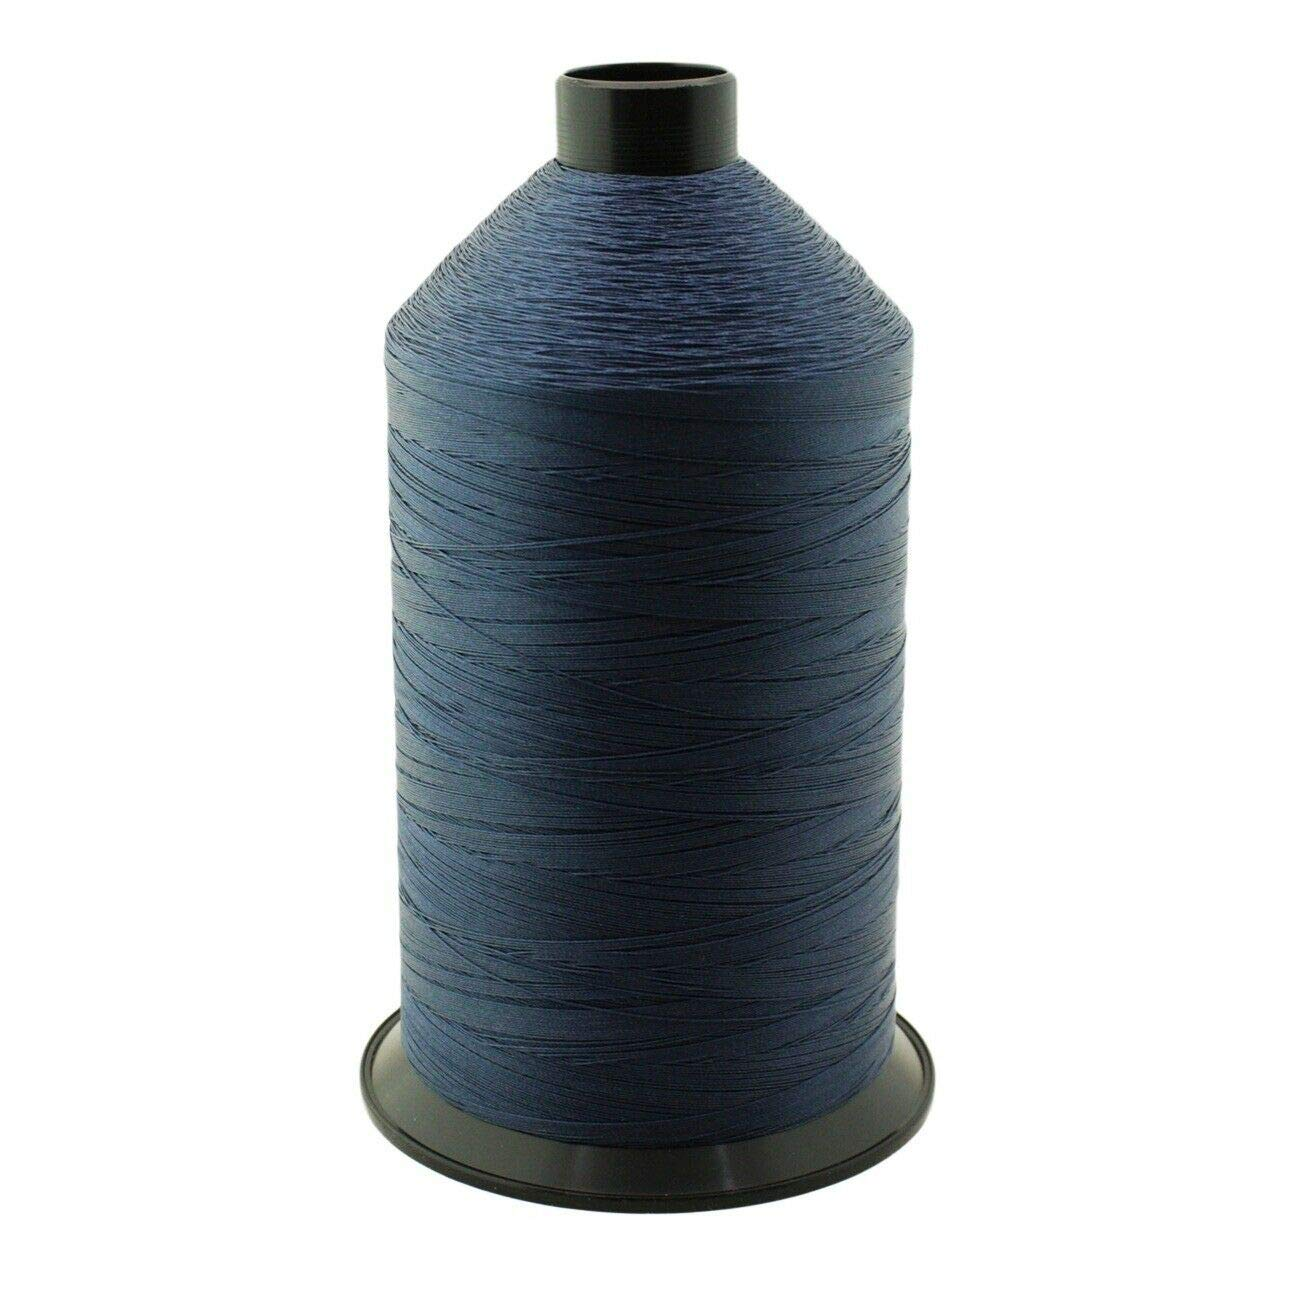 Fil-Tec Navy Bonded Nylon Thread BNT 69, T70, 16 Oz Spool, 6000 Yards by Fil-Tec